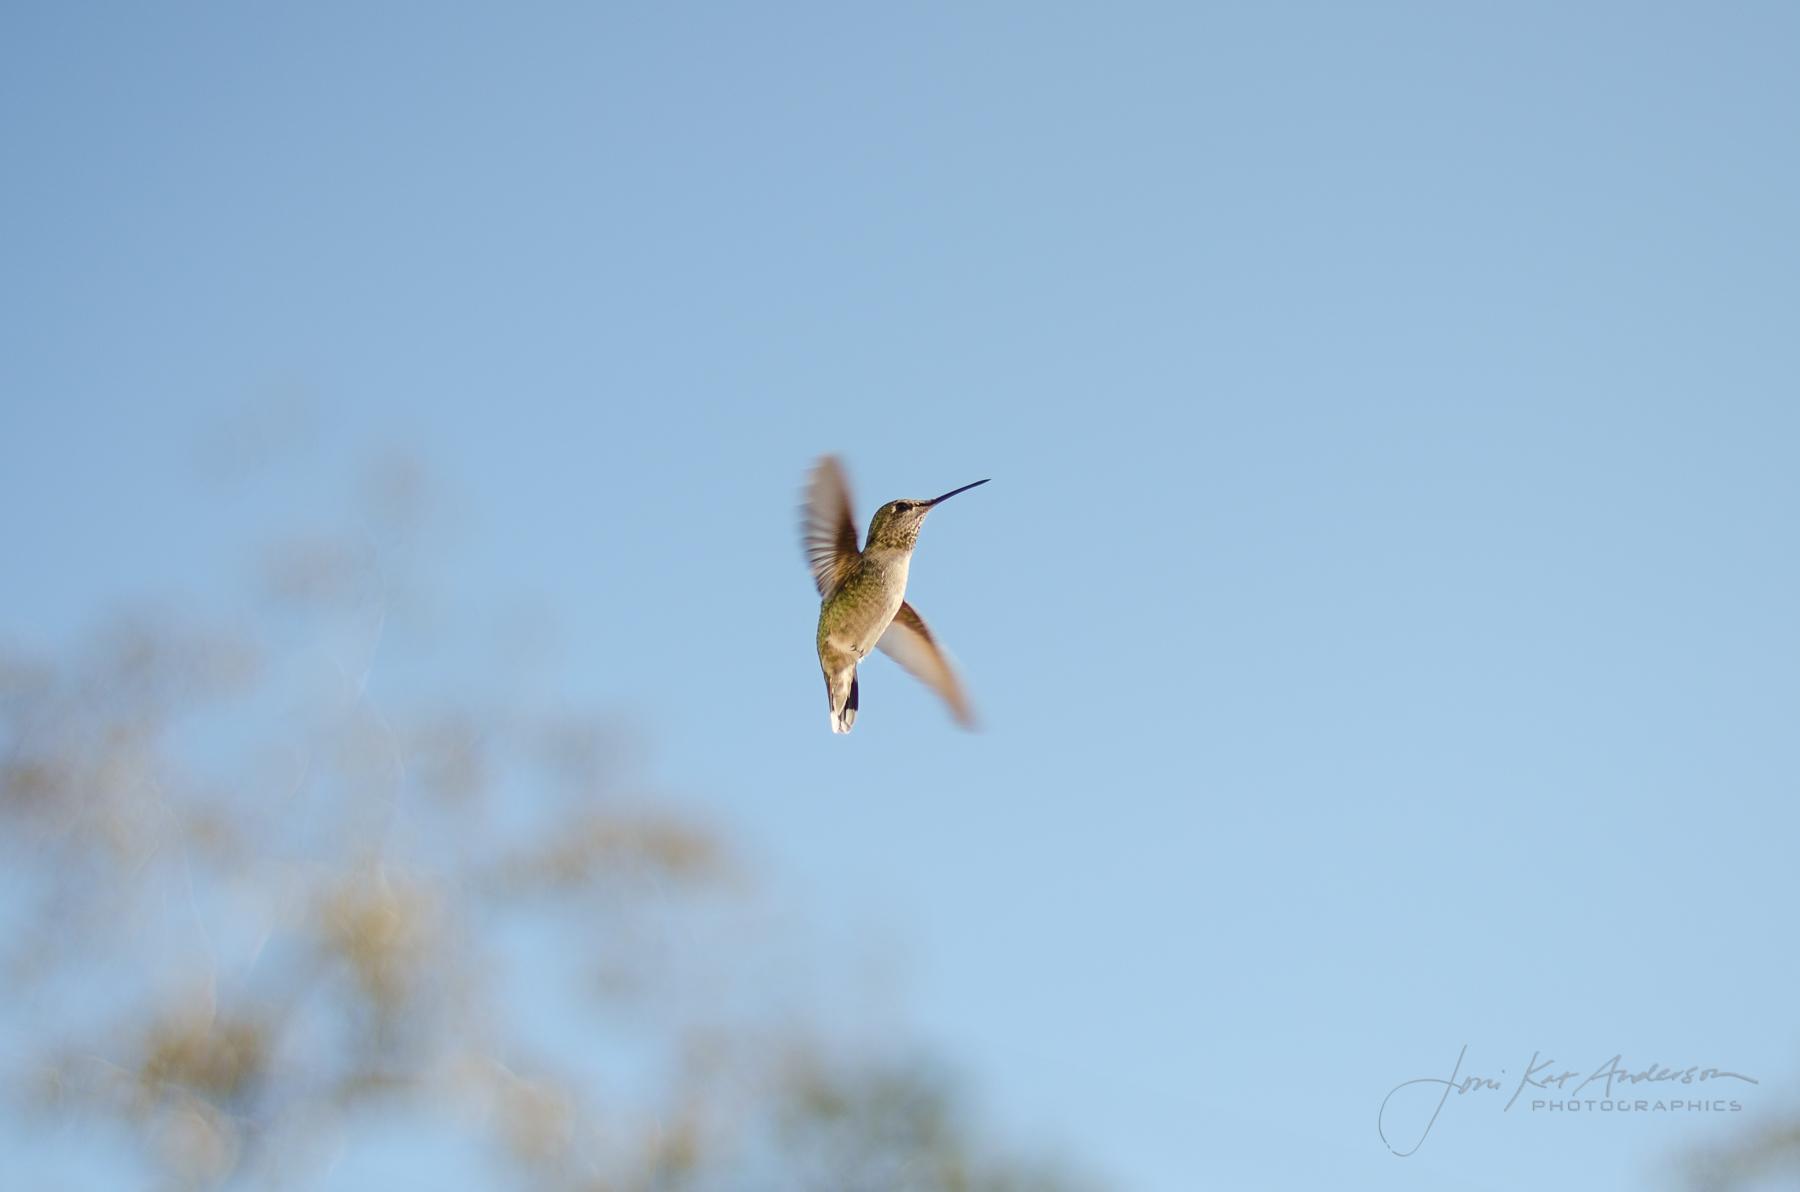 hummingbirds_dsc4254